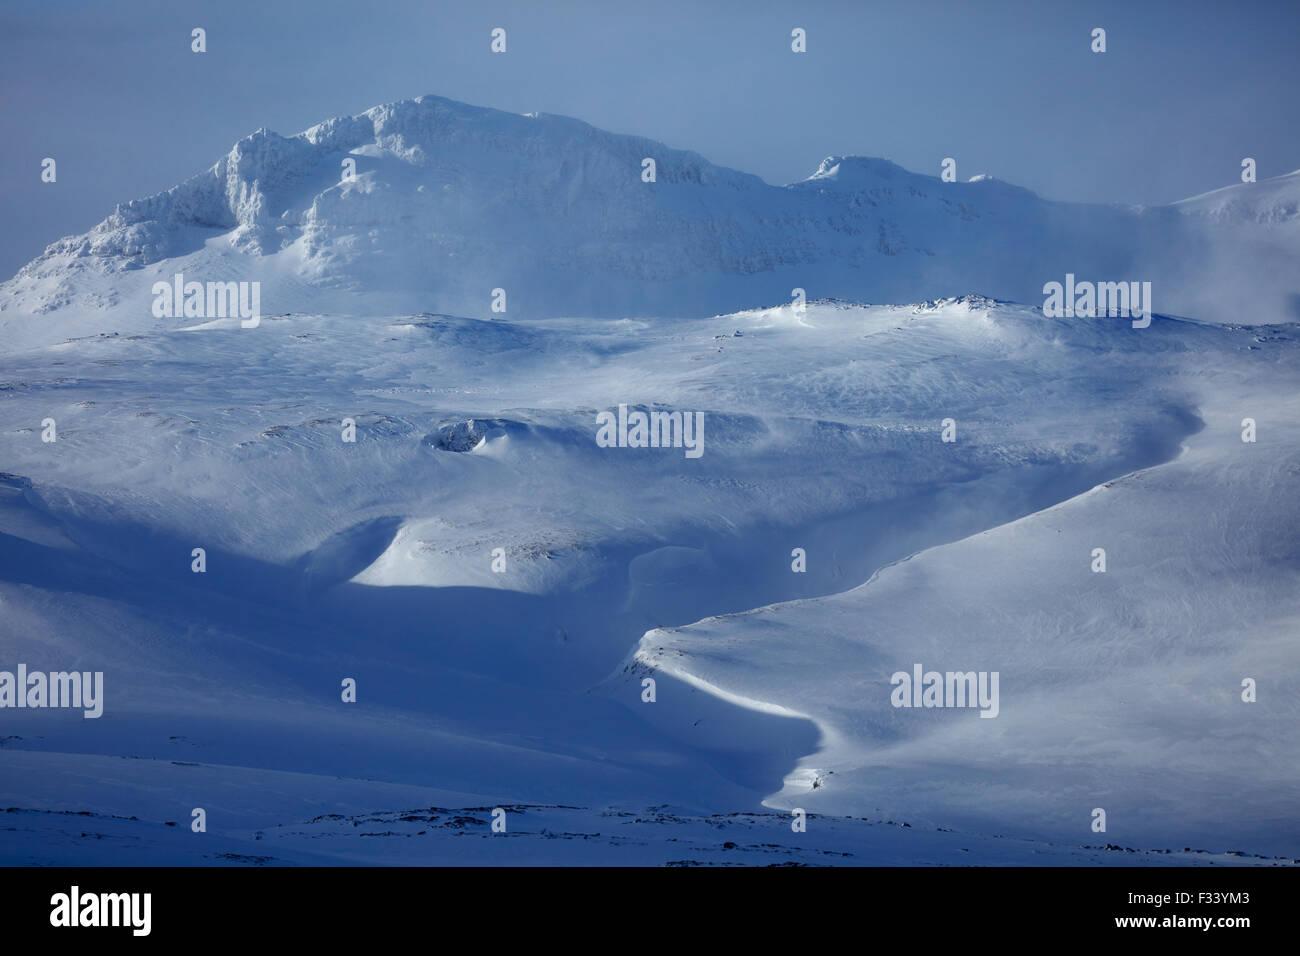 der Snæfellsjökull Gletscher, Snaefellsness-Halbinsel, Island Stockbild